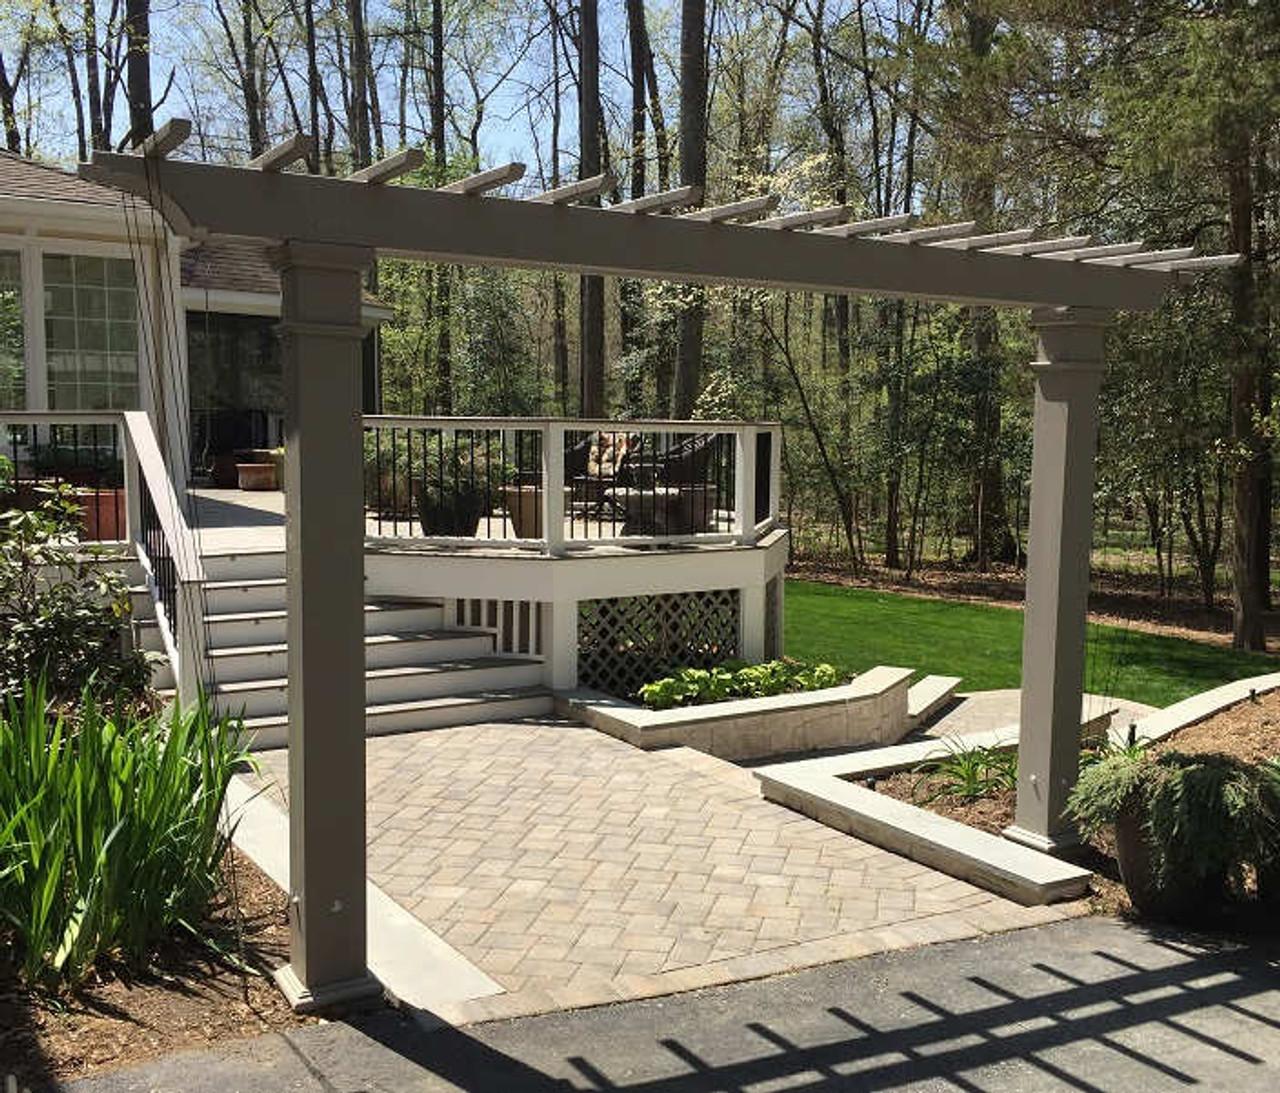 15' Structural Fiberglass Freestanding Entry Arbor with custom color, Midlothian, VA